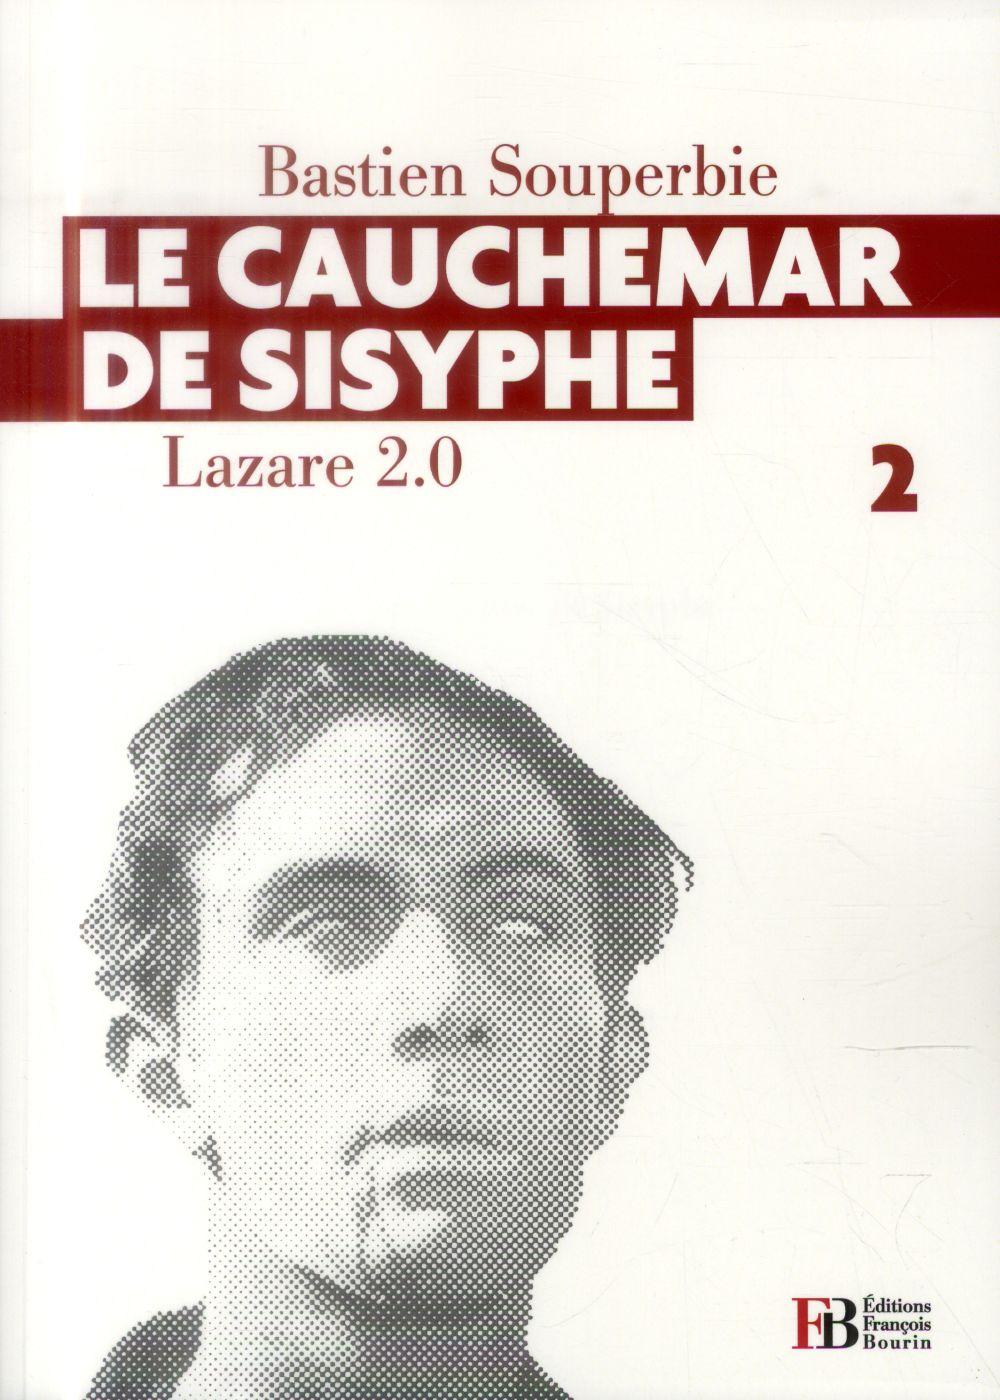 LE CAUCHEMAR DE SISYPHE